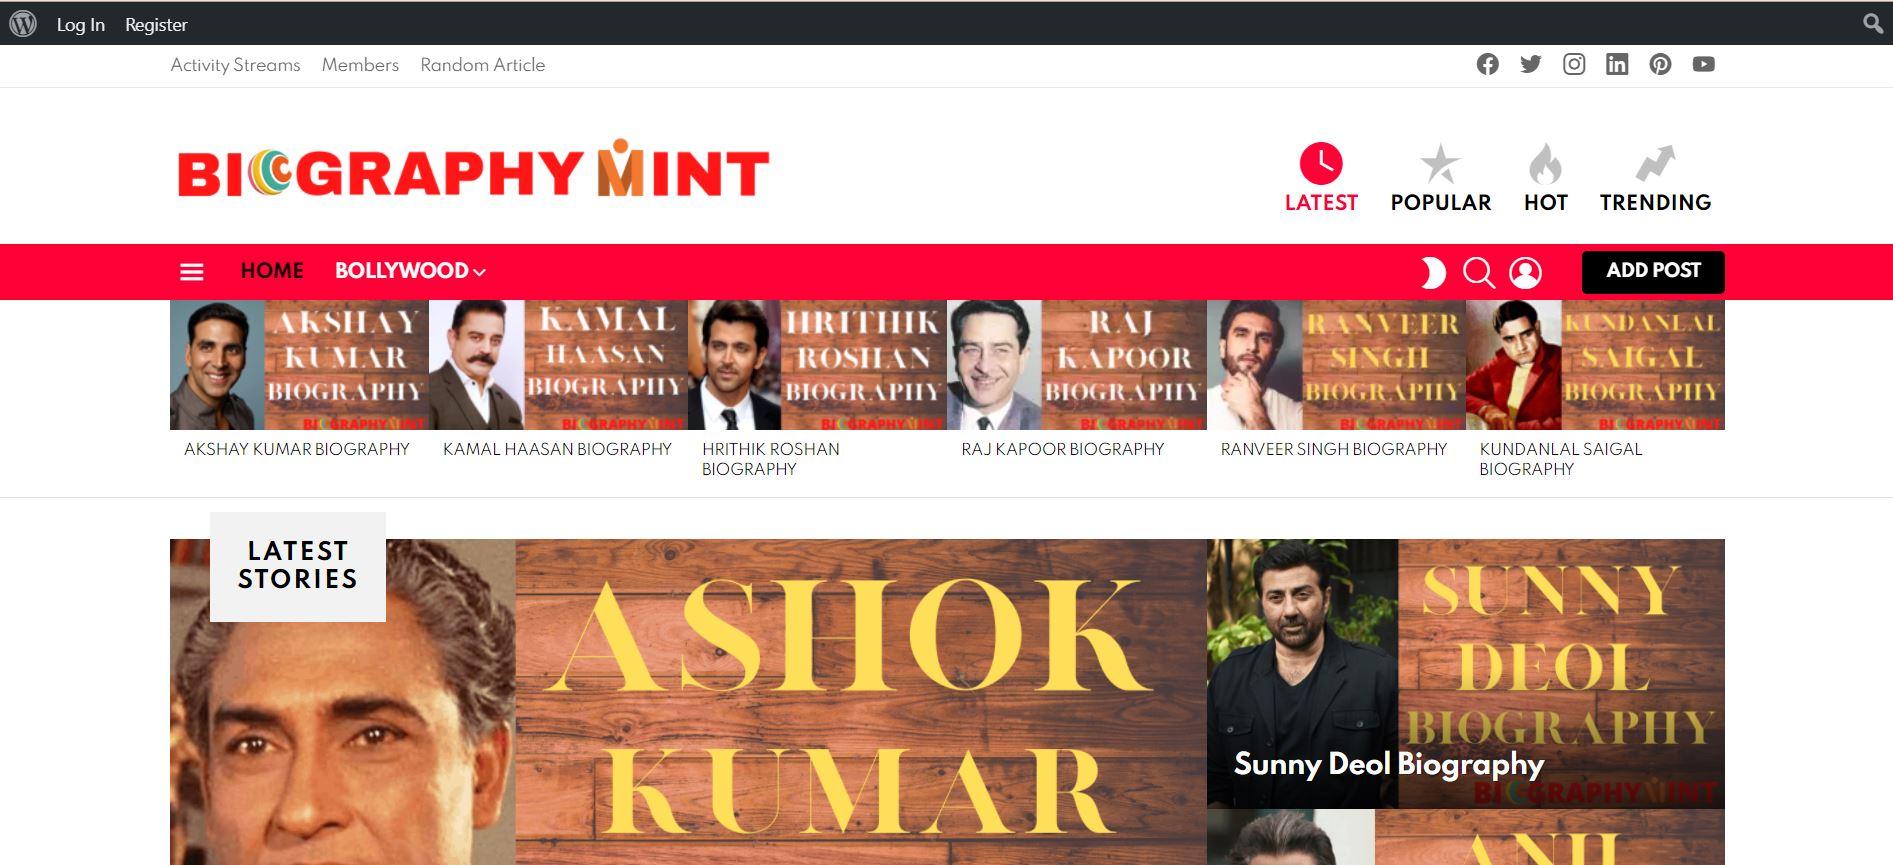 Biography Mint